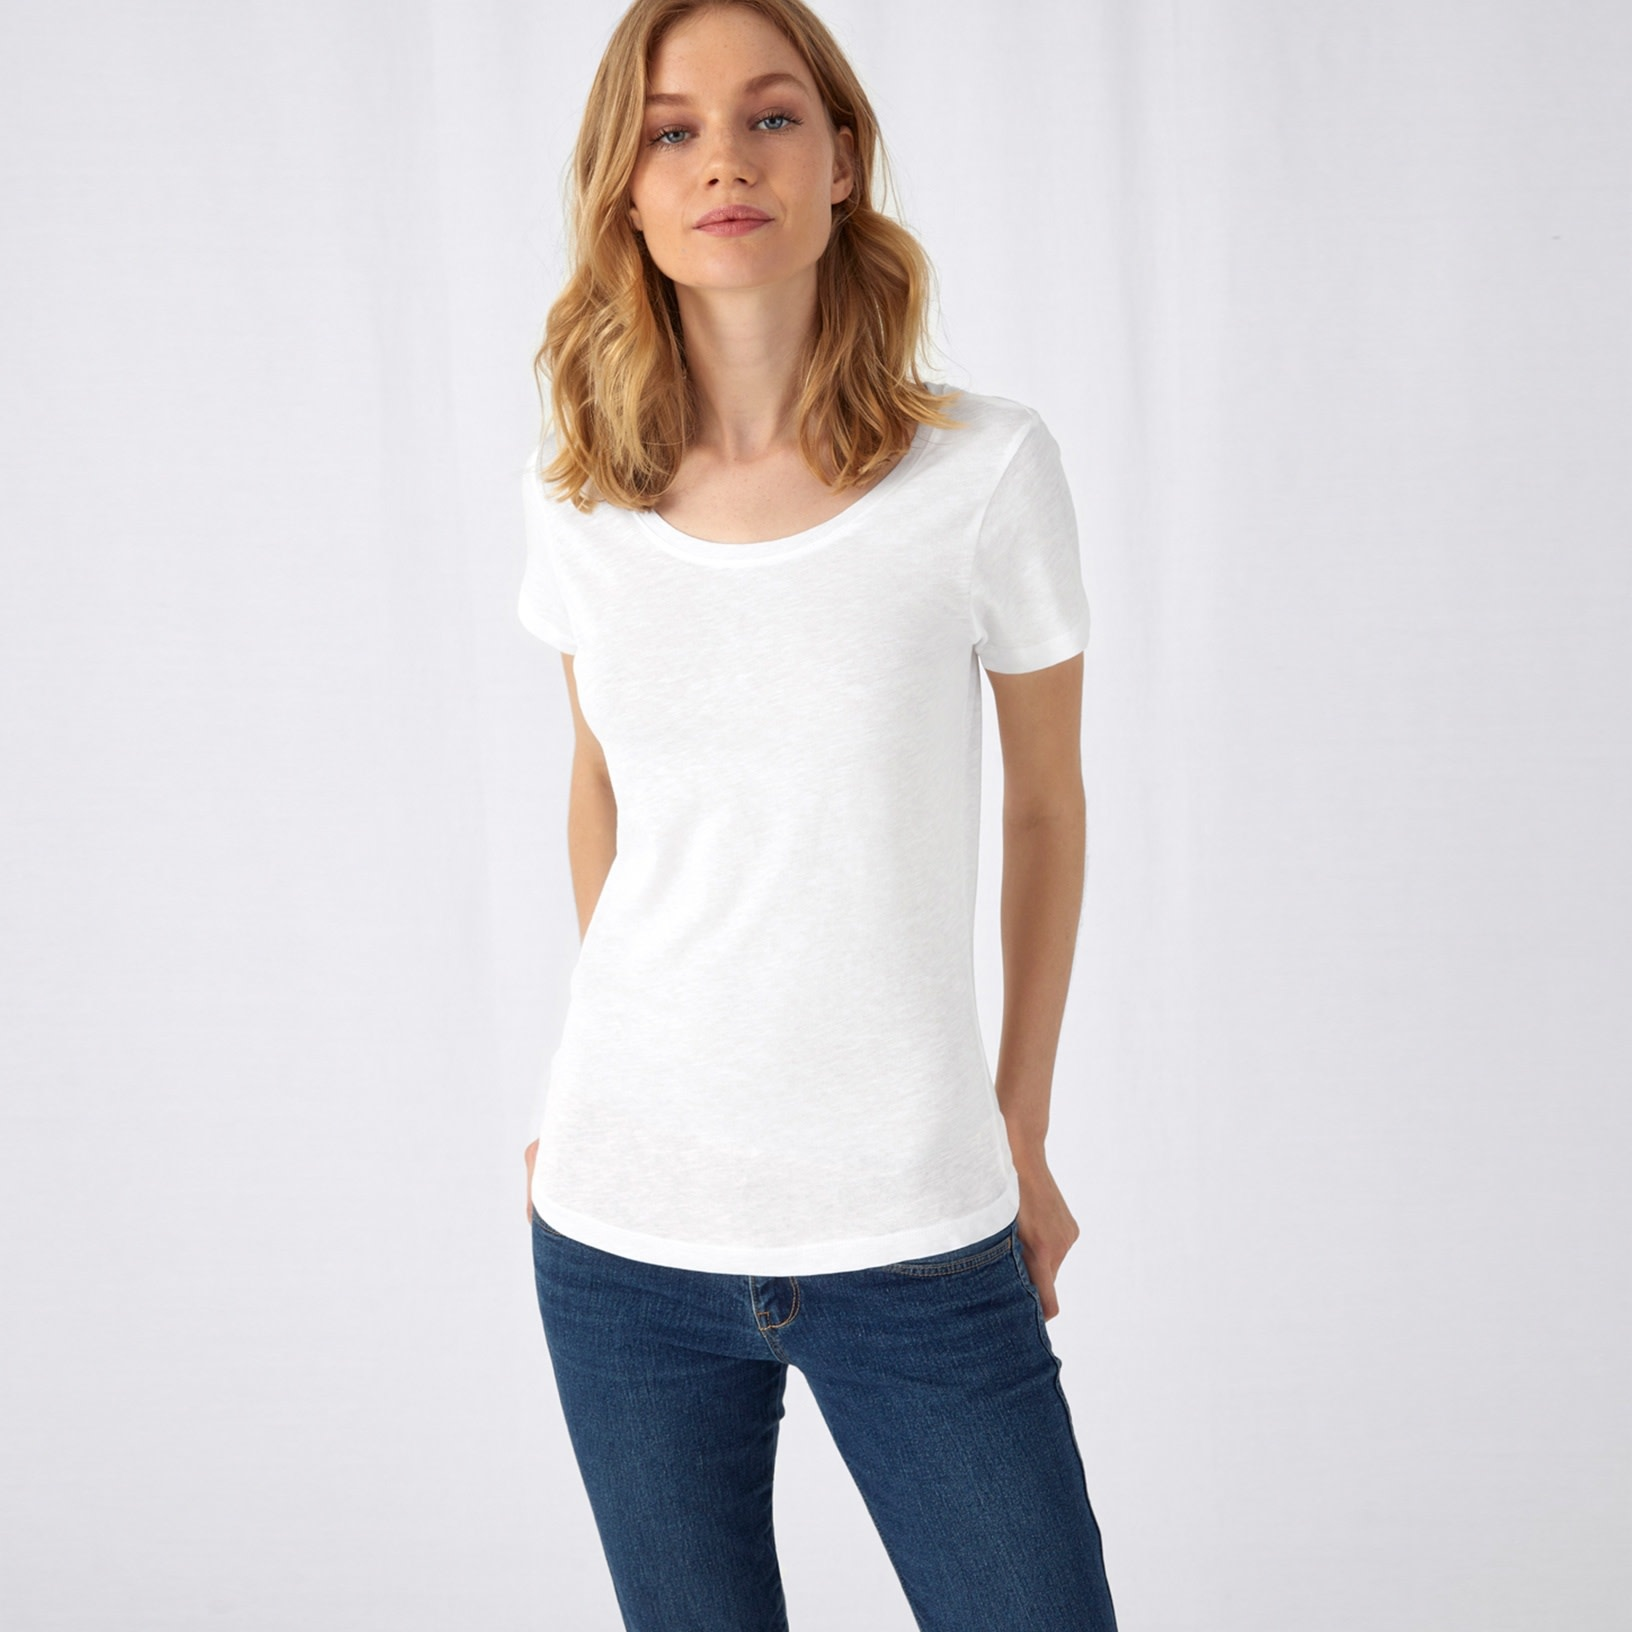 B&C Women Cotton Jersey